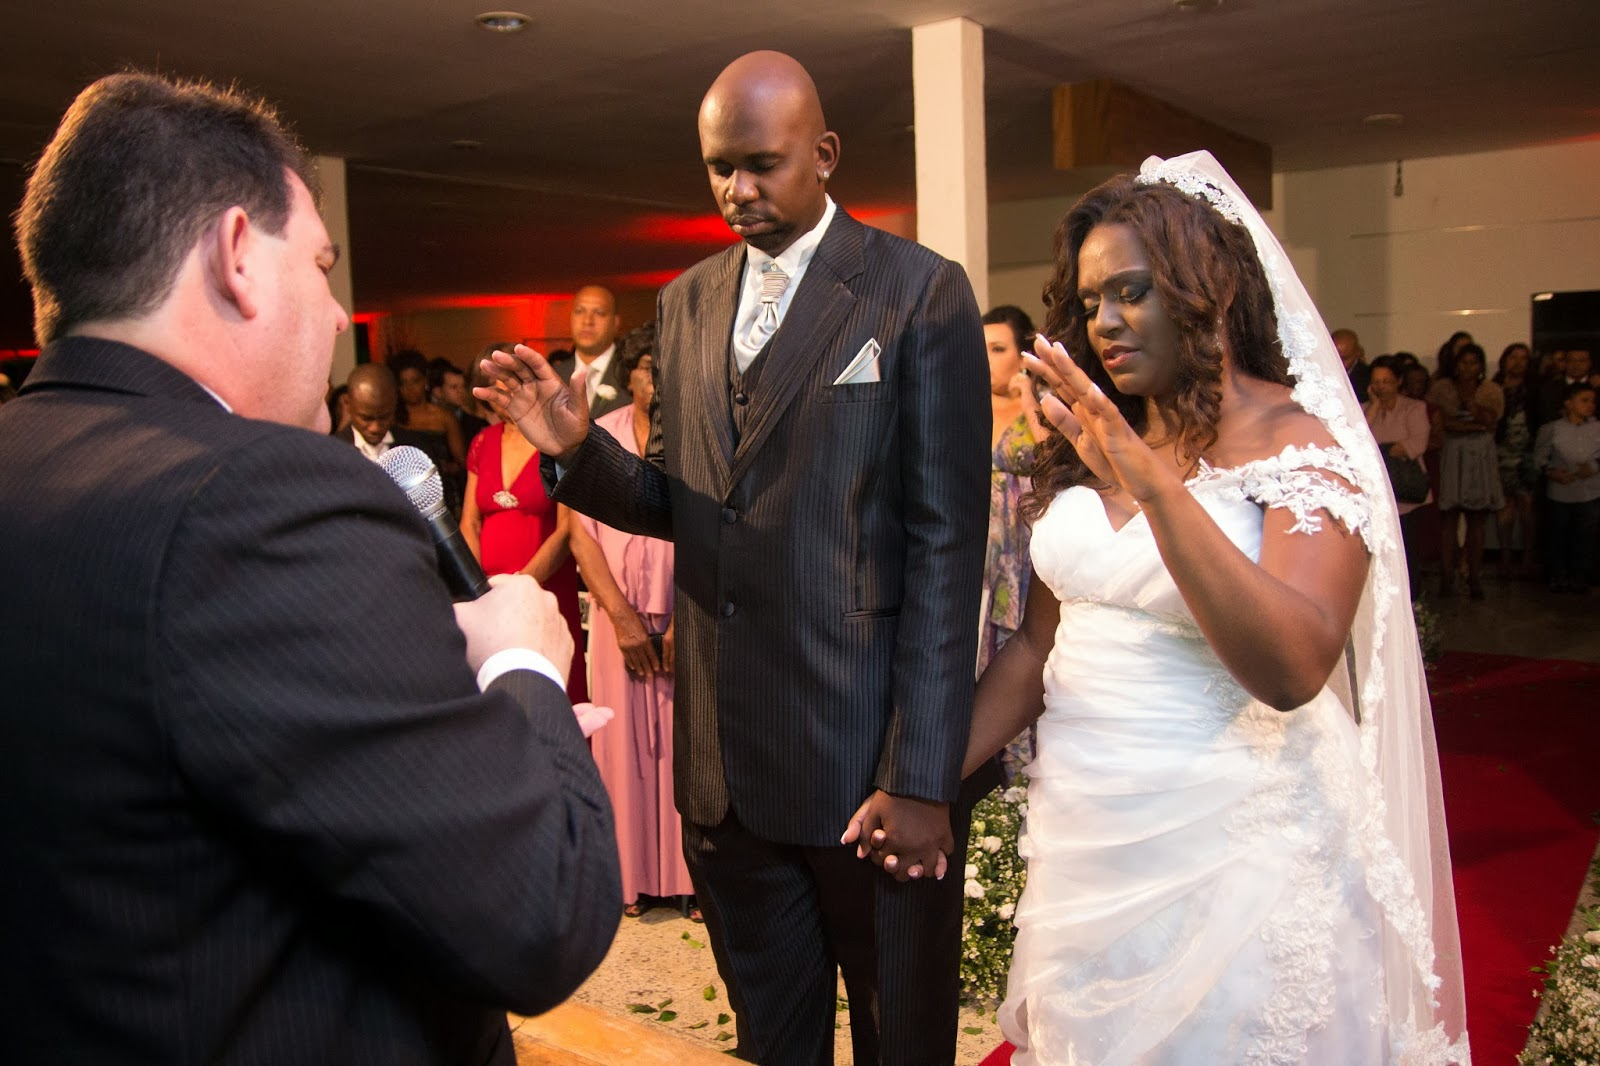 historia-amor-fe-cerimonia-noivos-bencao-1